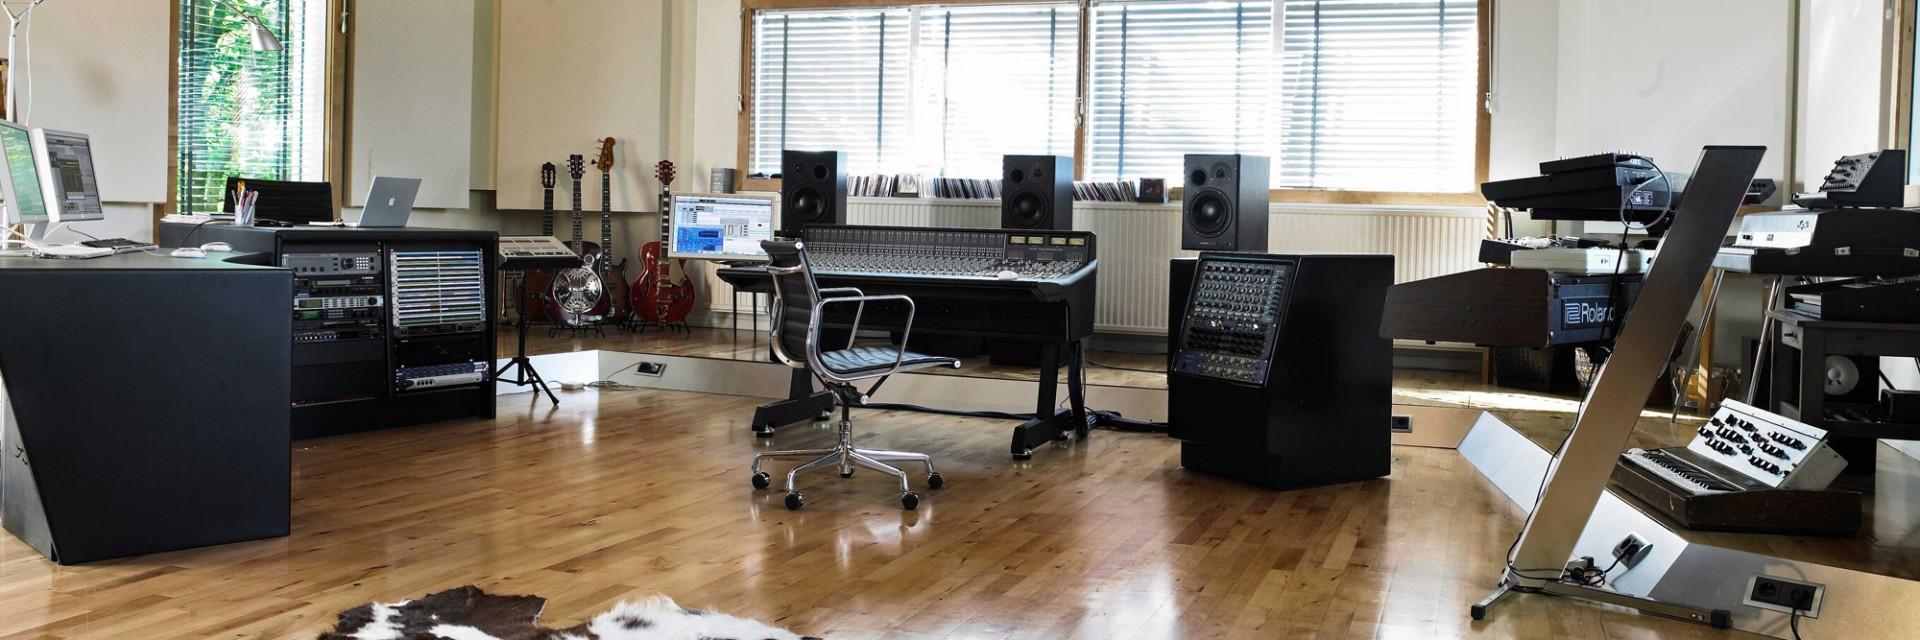 control-room-a-1920x640.jpg